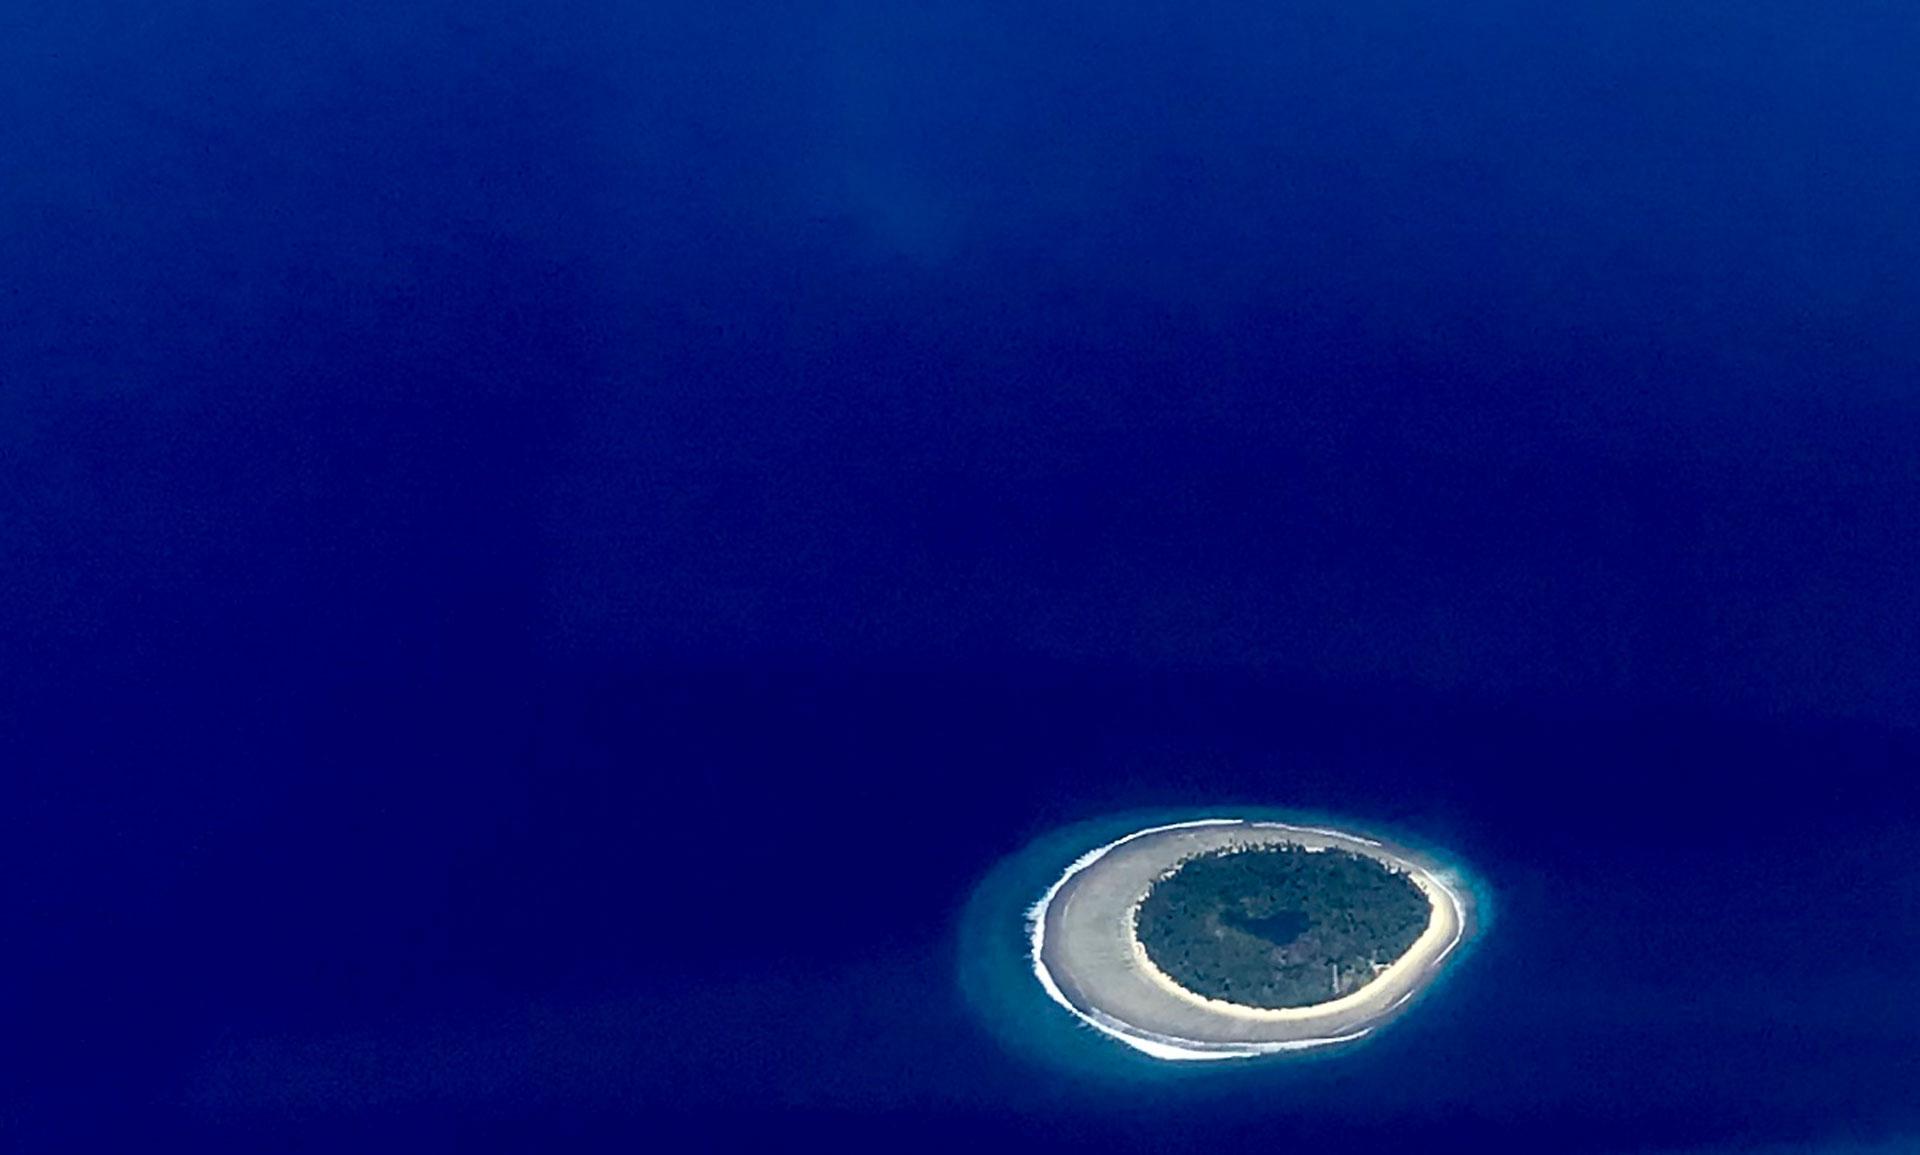 Cyril-over-Sumatra